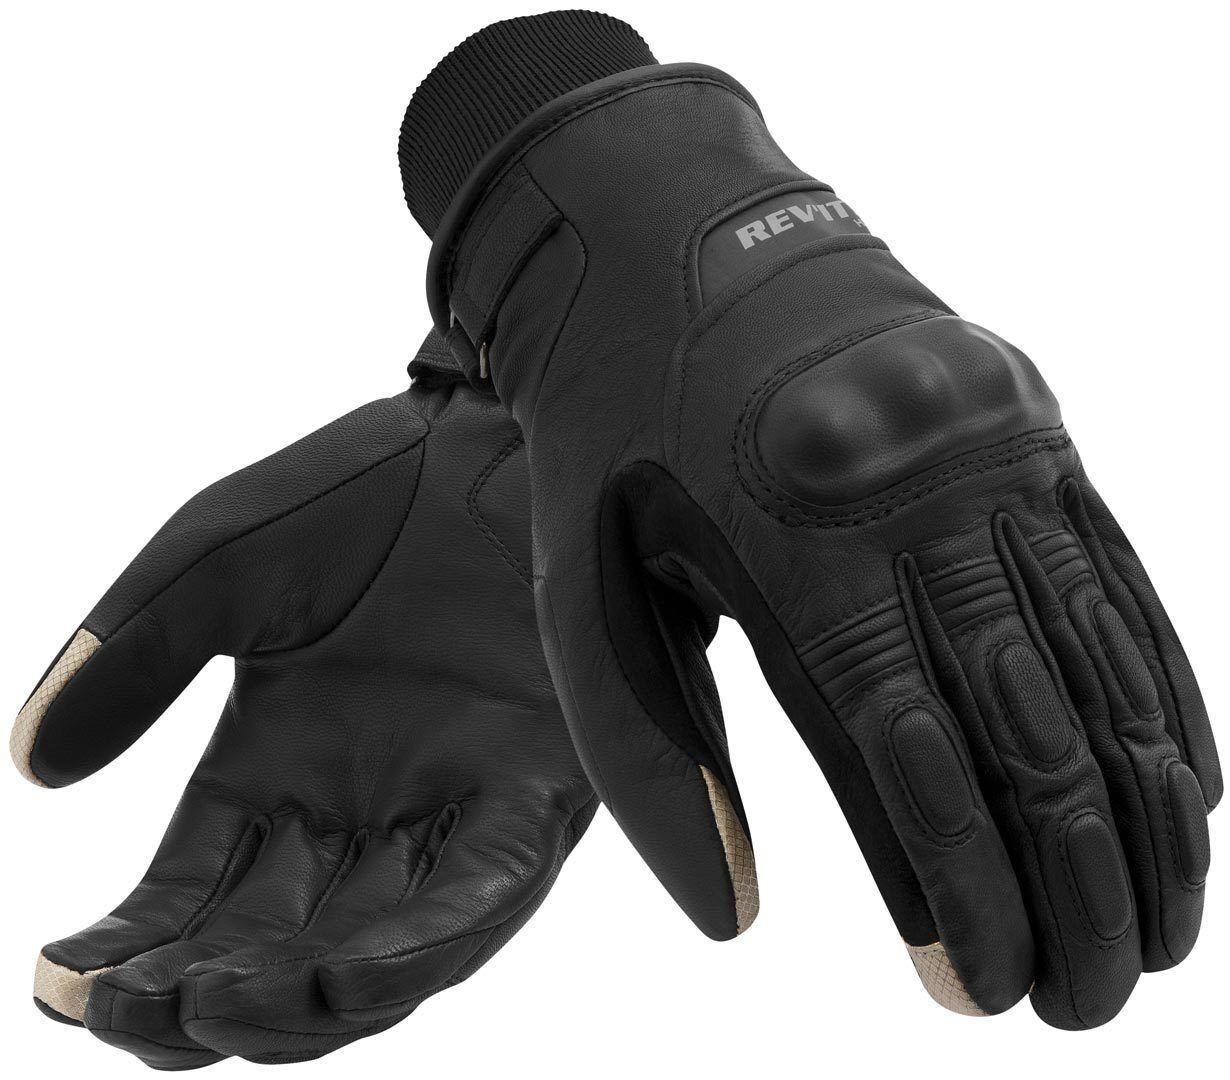 Revit Boxxer H2O Waterproof Gloves  - Size: 3X-Large